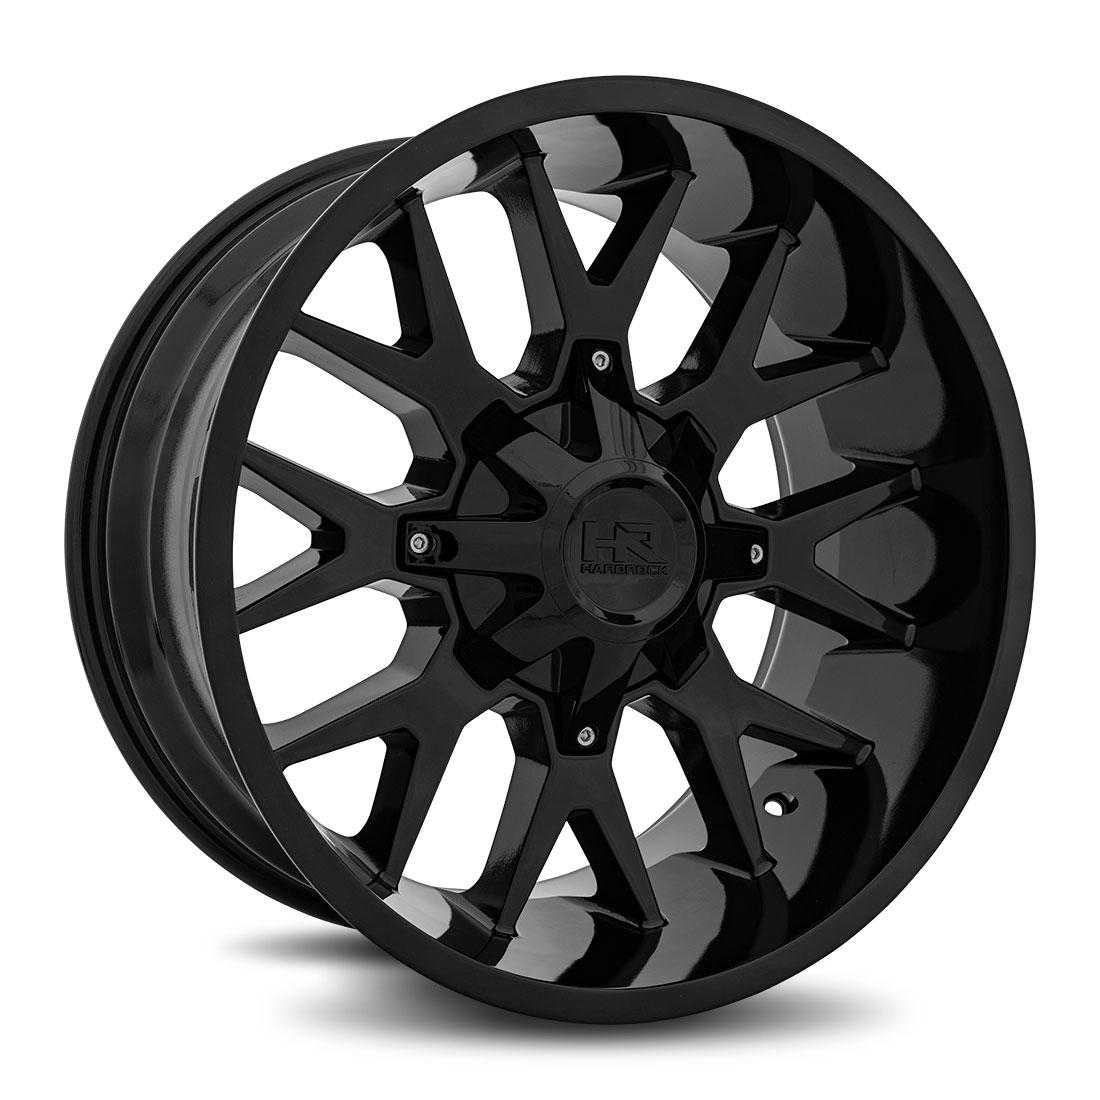 Hardrock Offroad Wheels H700 Affliction - Gloss Black - 20x10